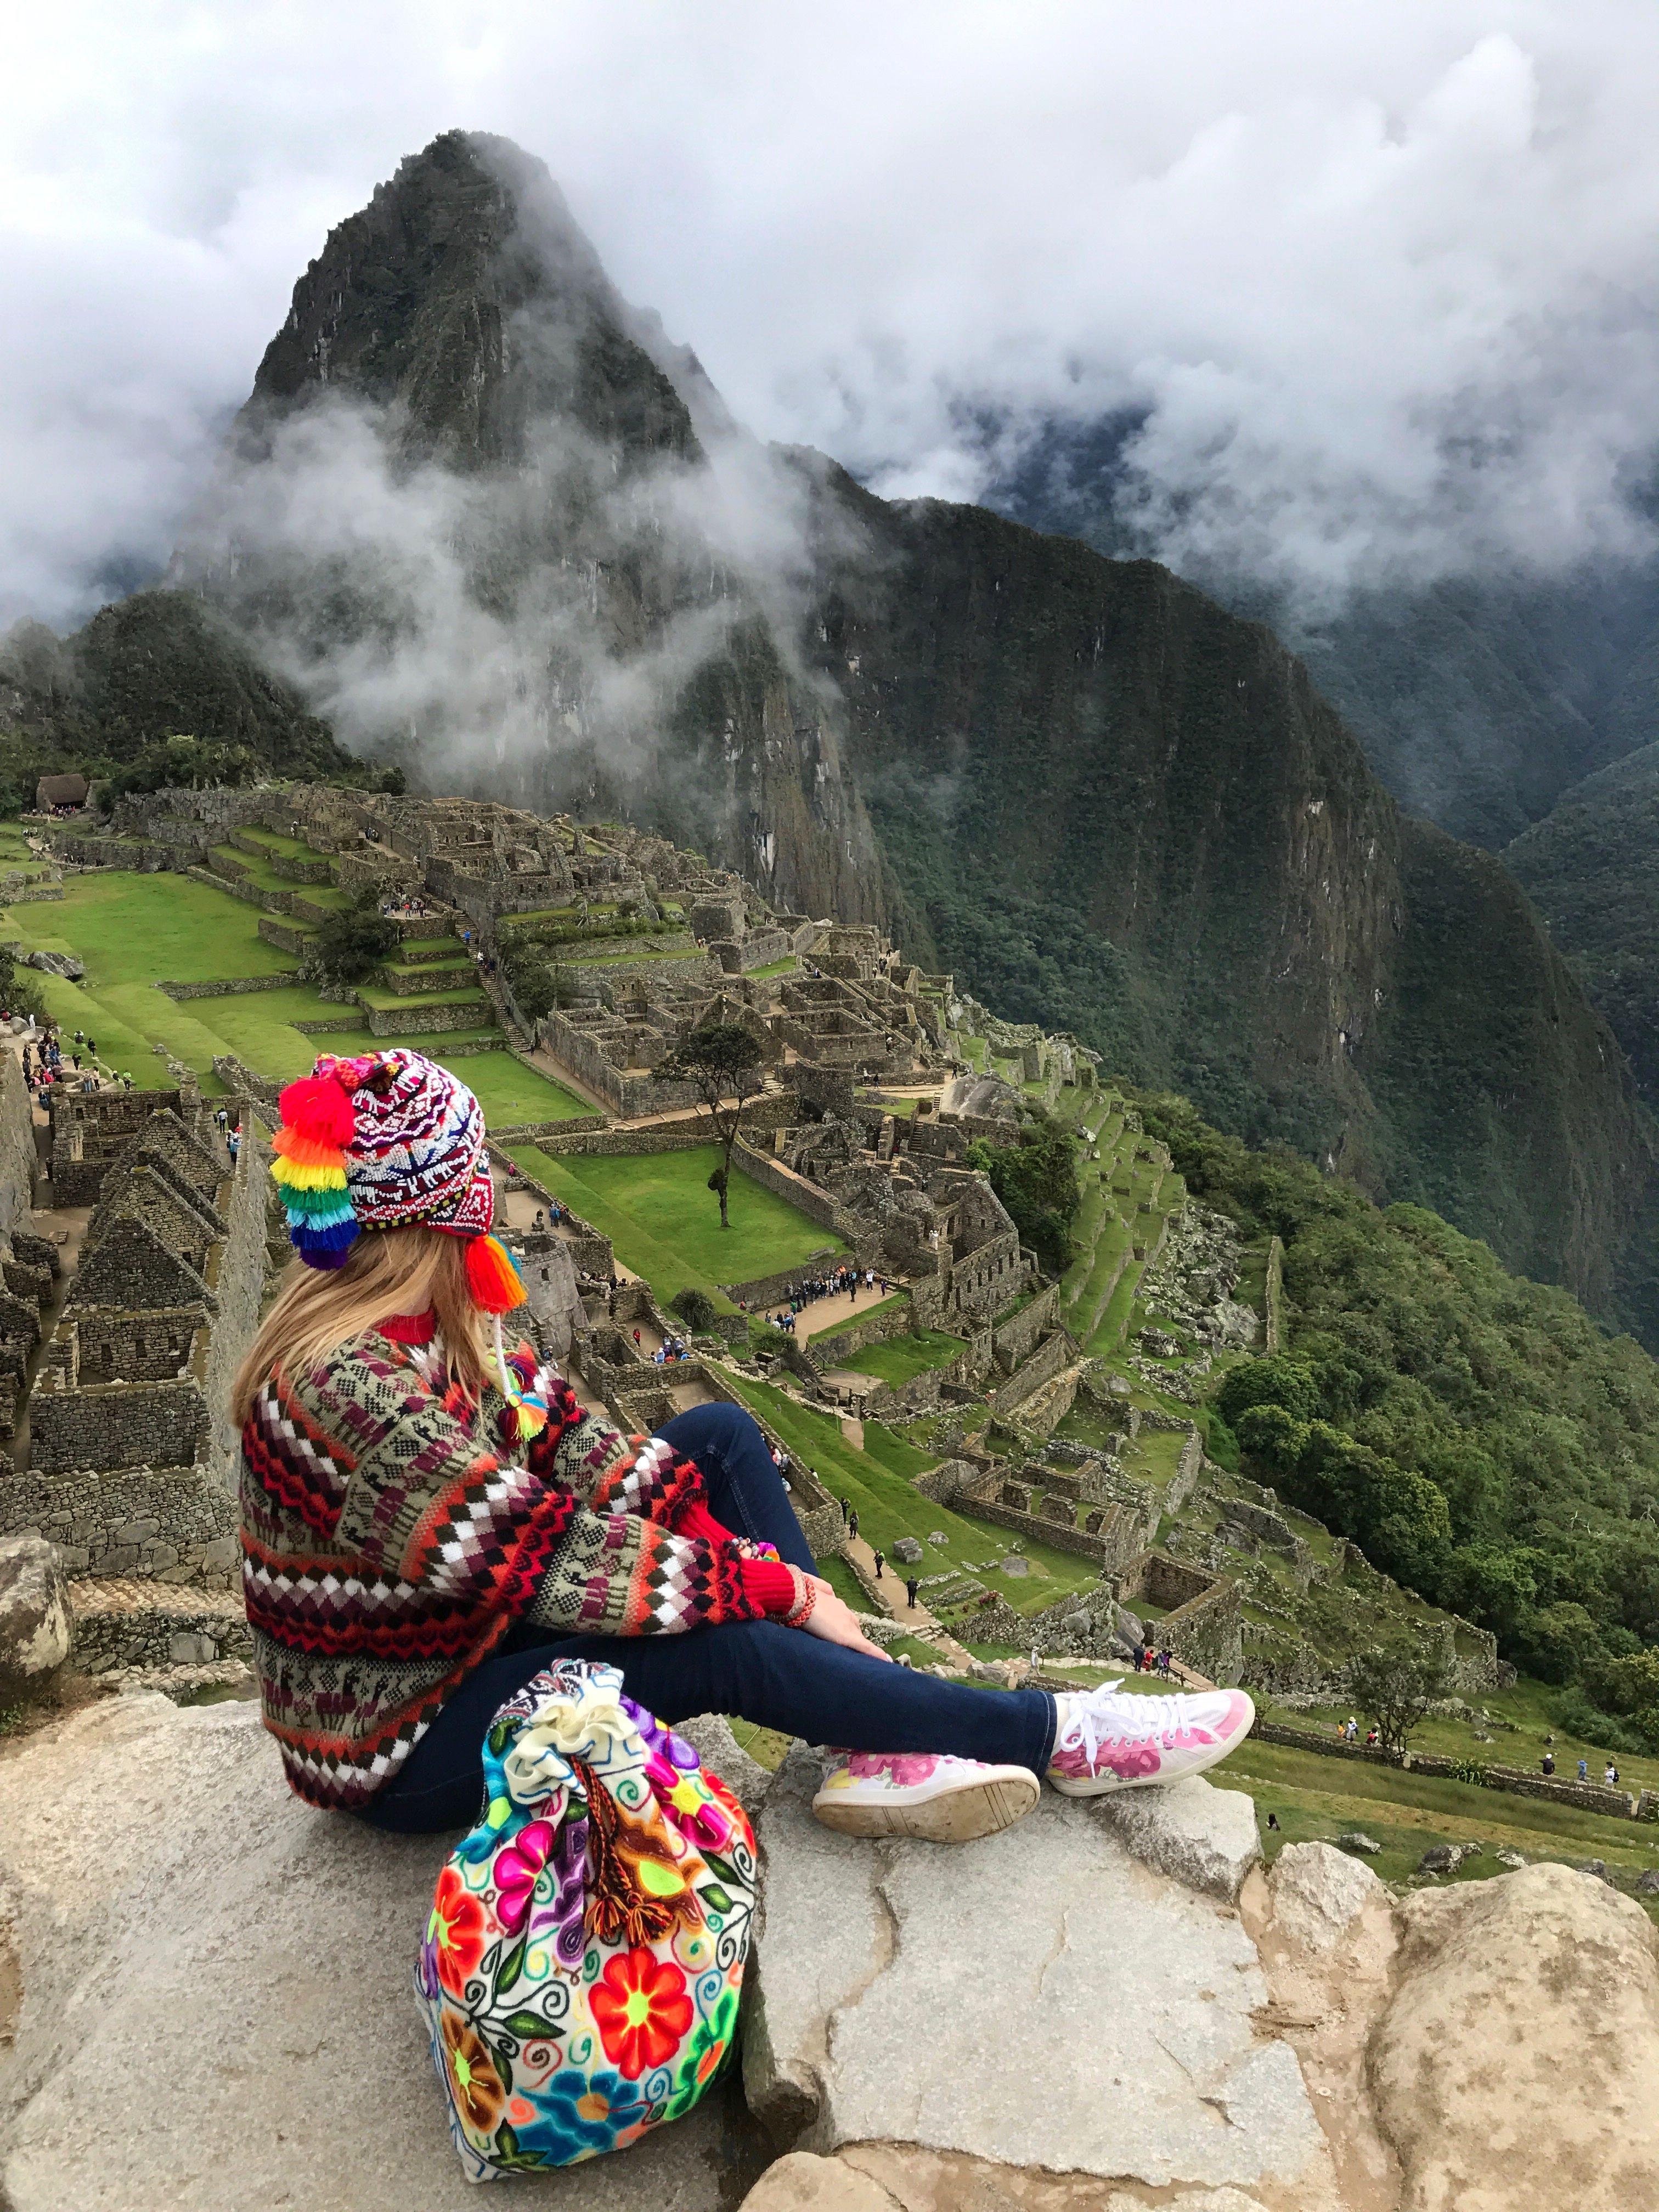 Peru Machu Picchu By Keepeyesopen Machu Picchu Photography Machu Pichu Travel Macchu Picchu